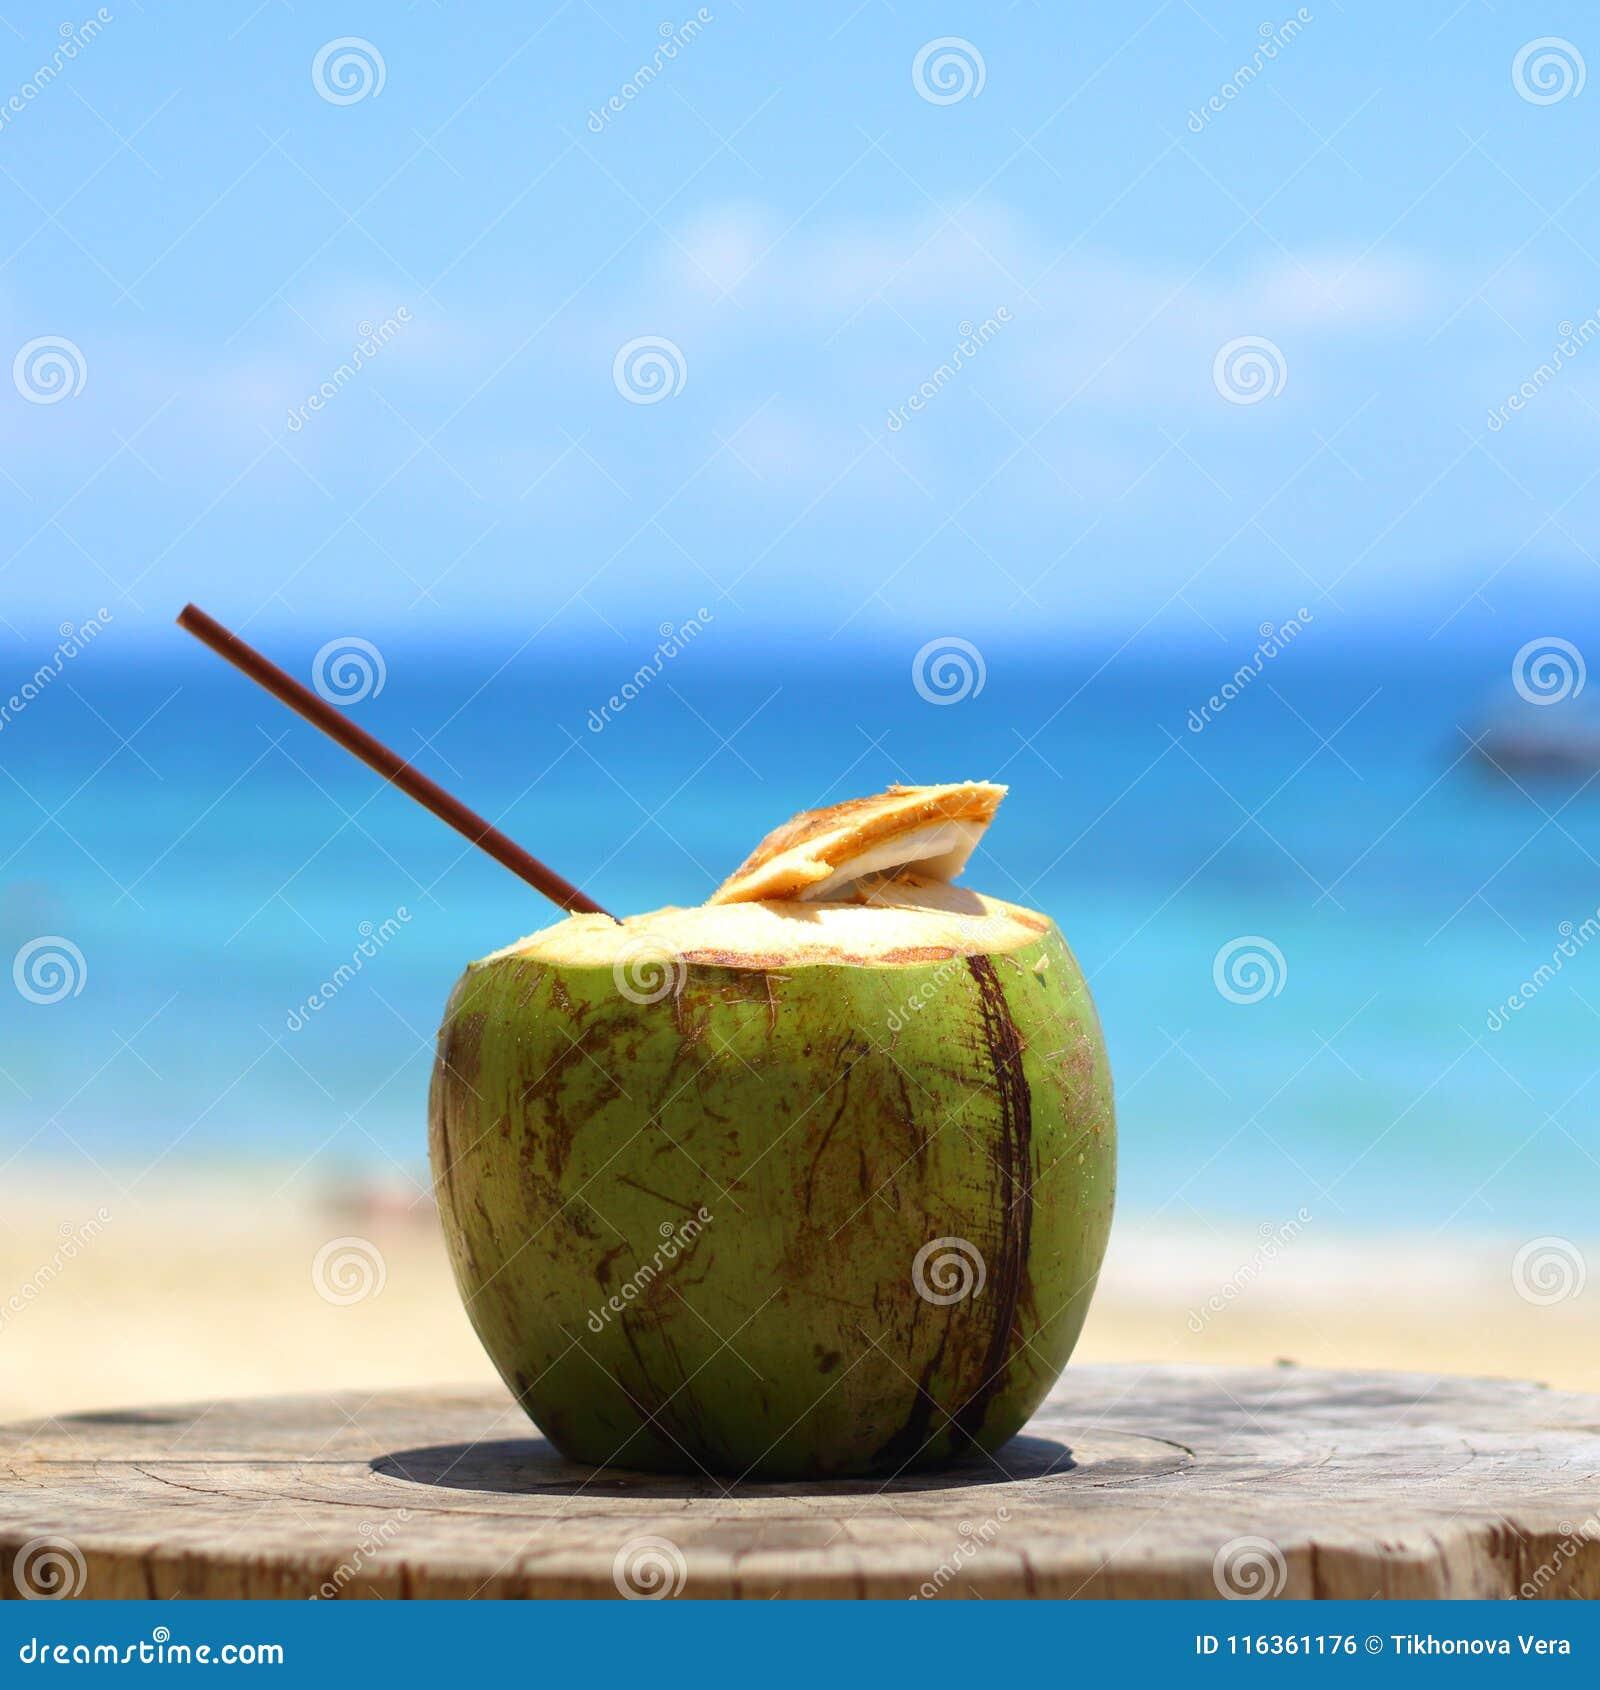 Coconut juice on the beach